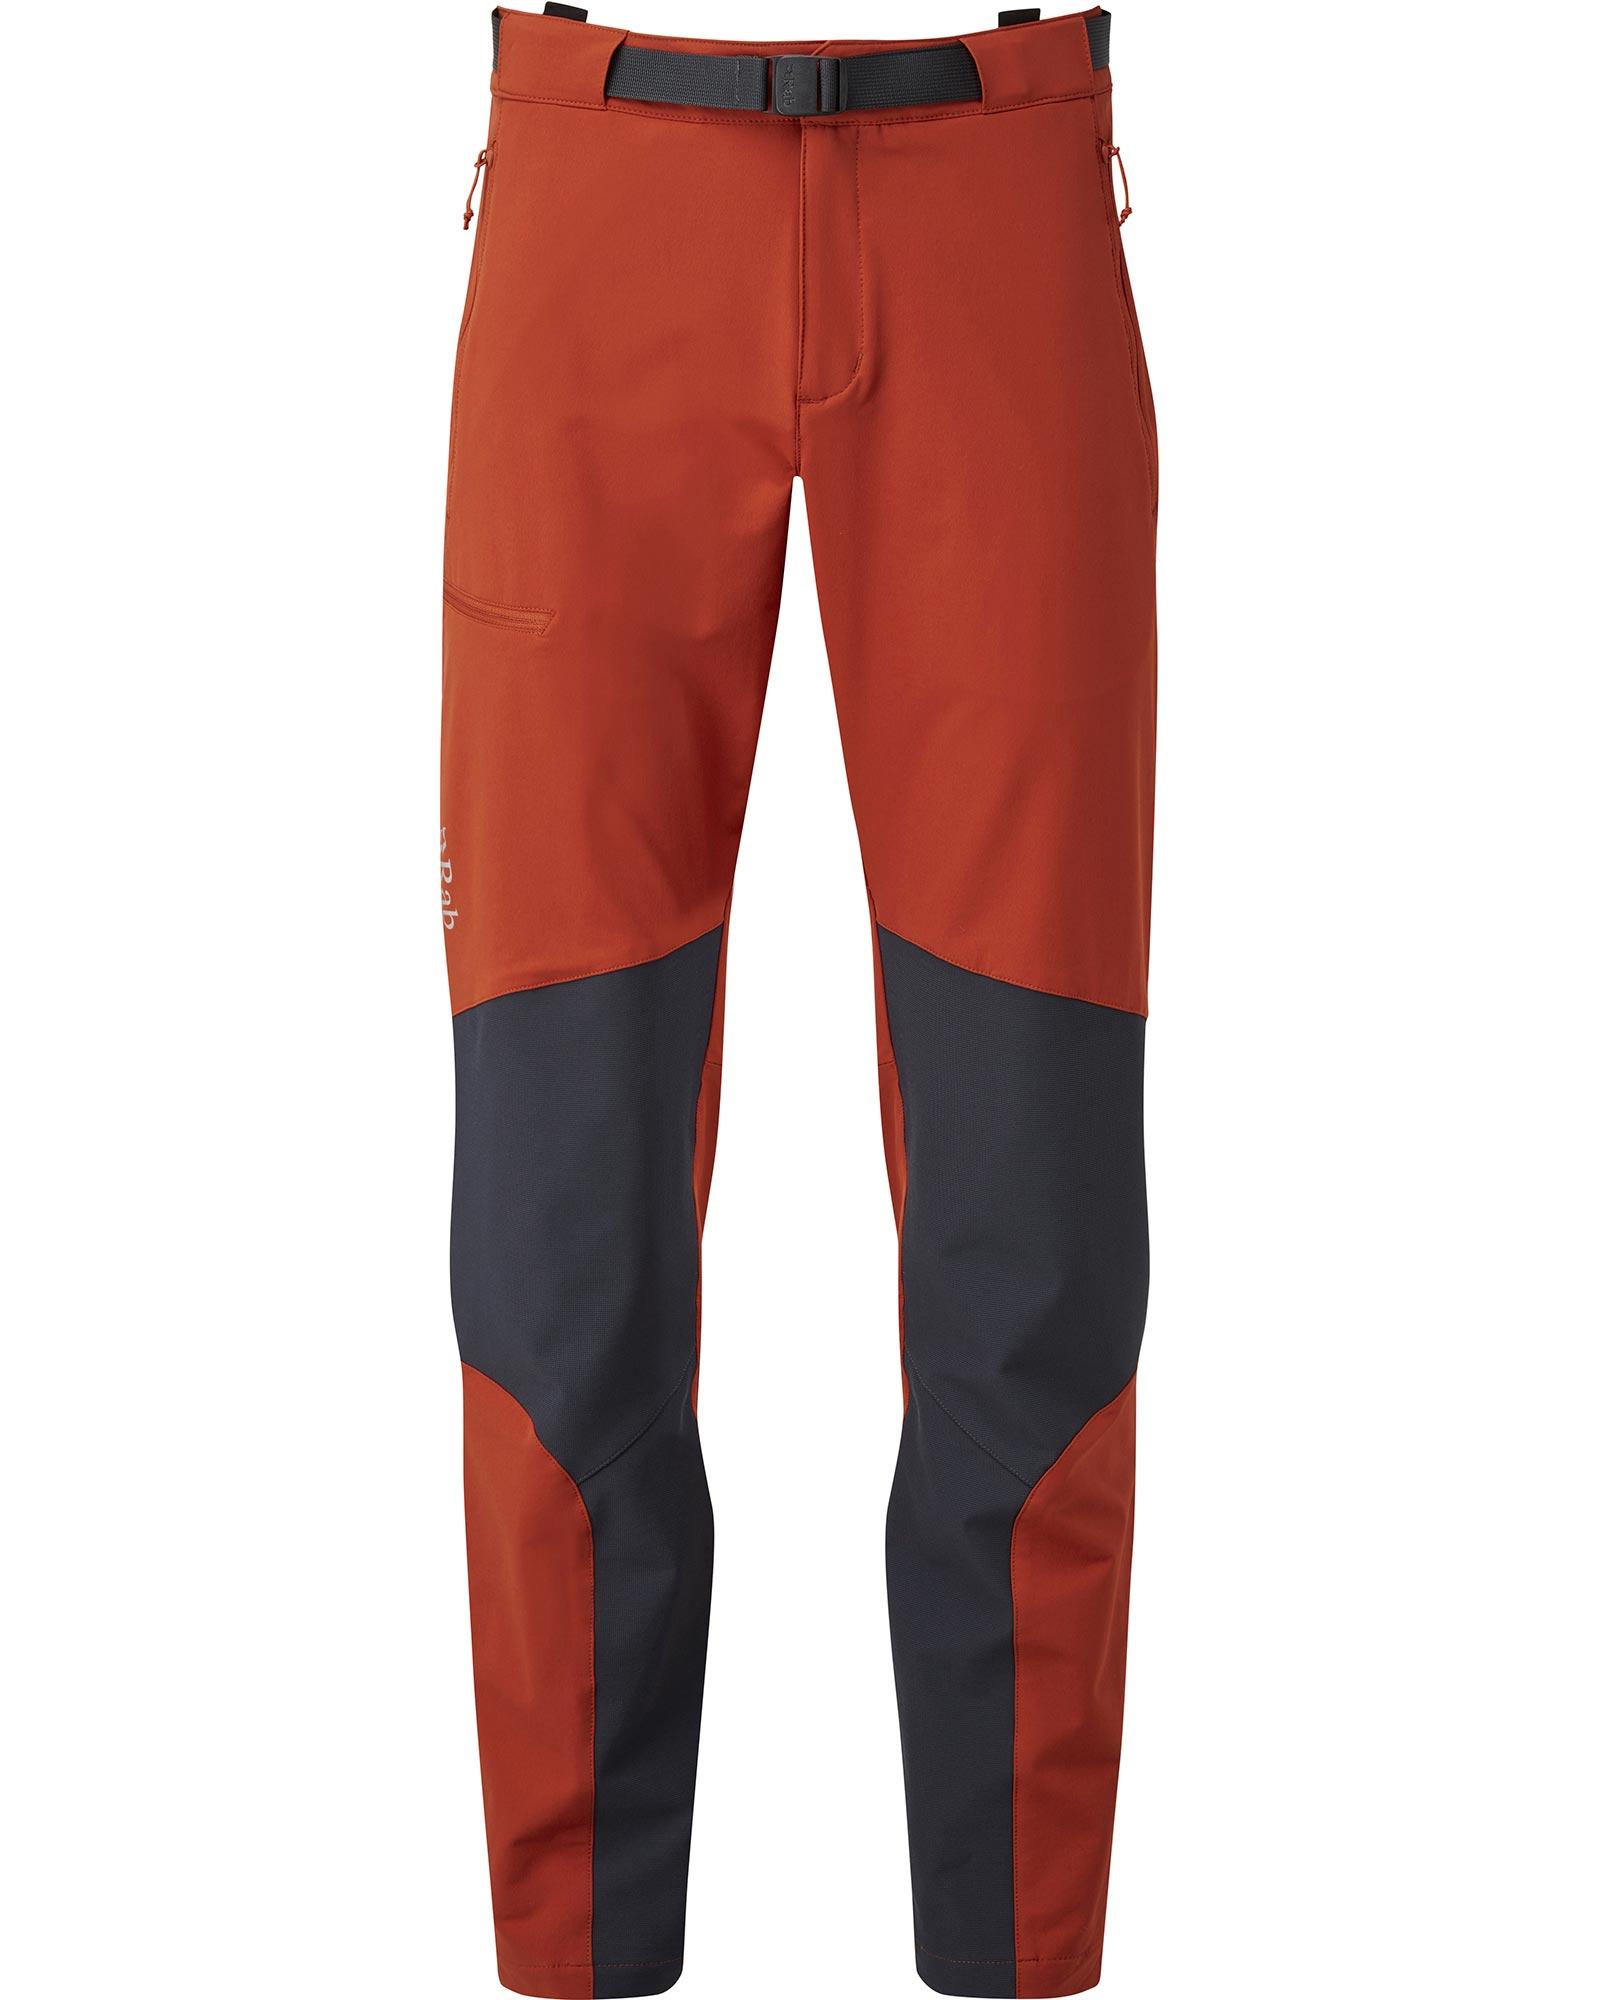 Rab Men's Spire Pants 0